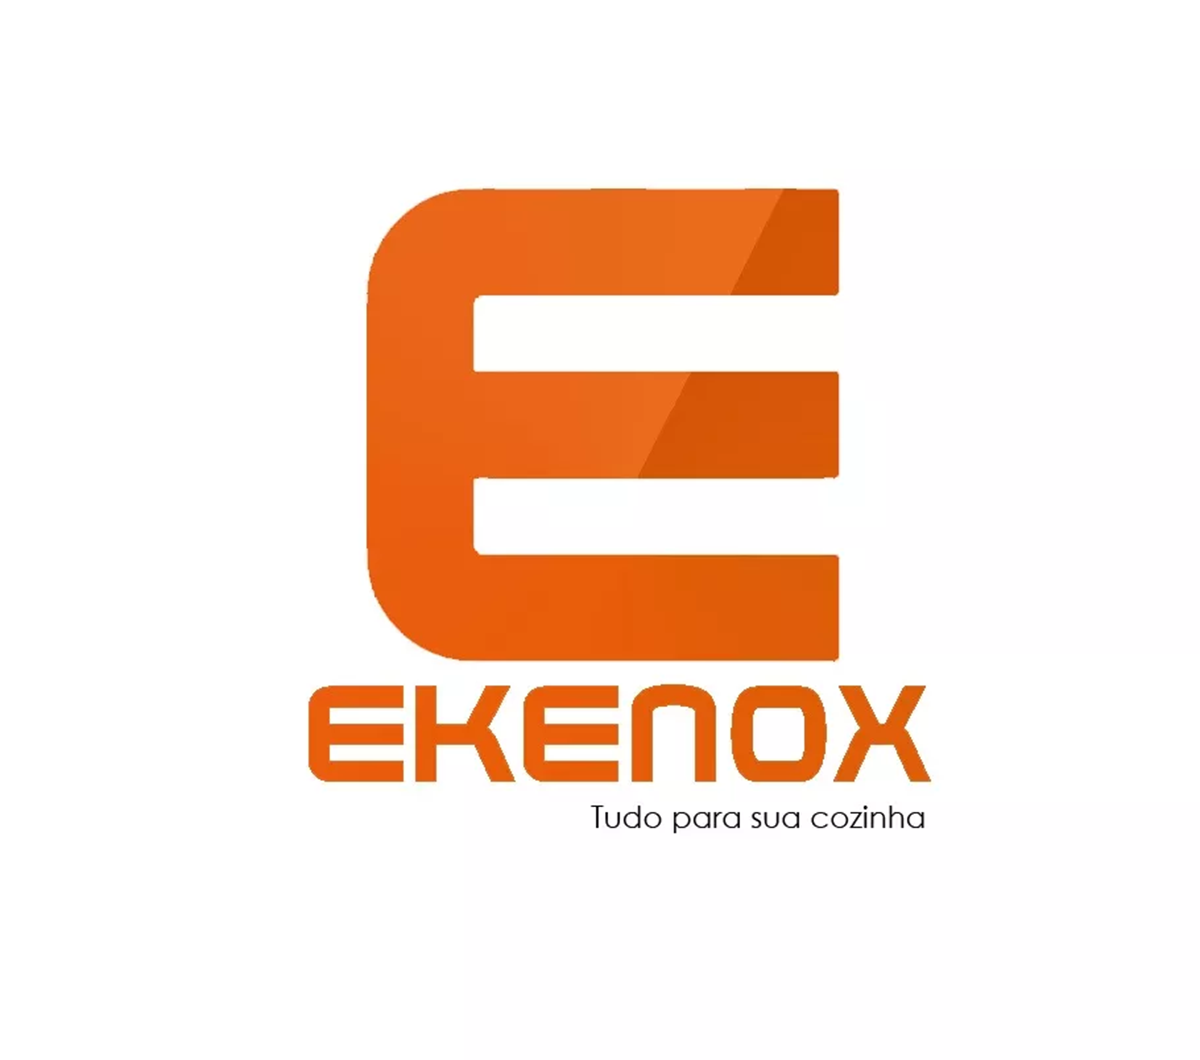 Mesa Inox Especiale 190 x 55 C/ Prateleira   - EKENOX- Equipamentos Industriais